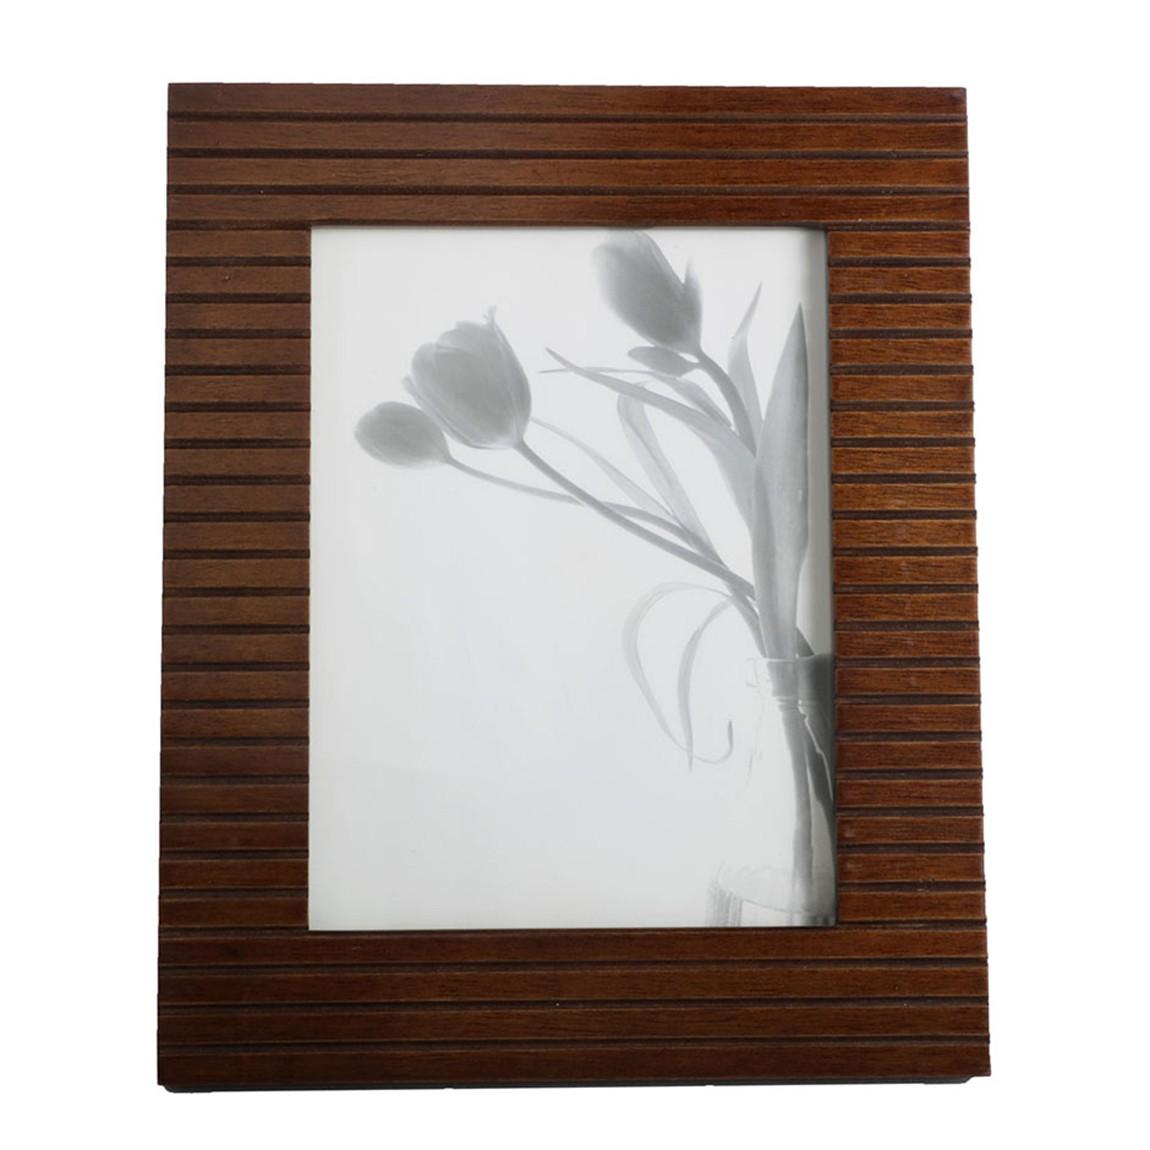 Portarretratos madera lineas 5x7